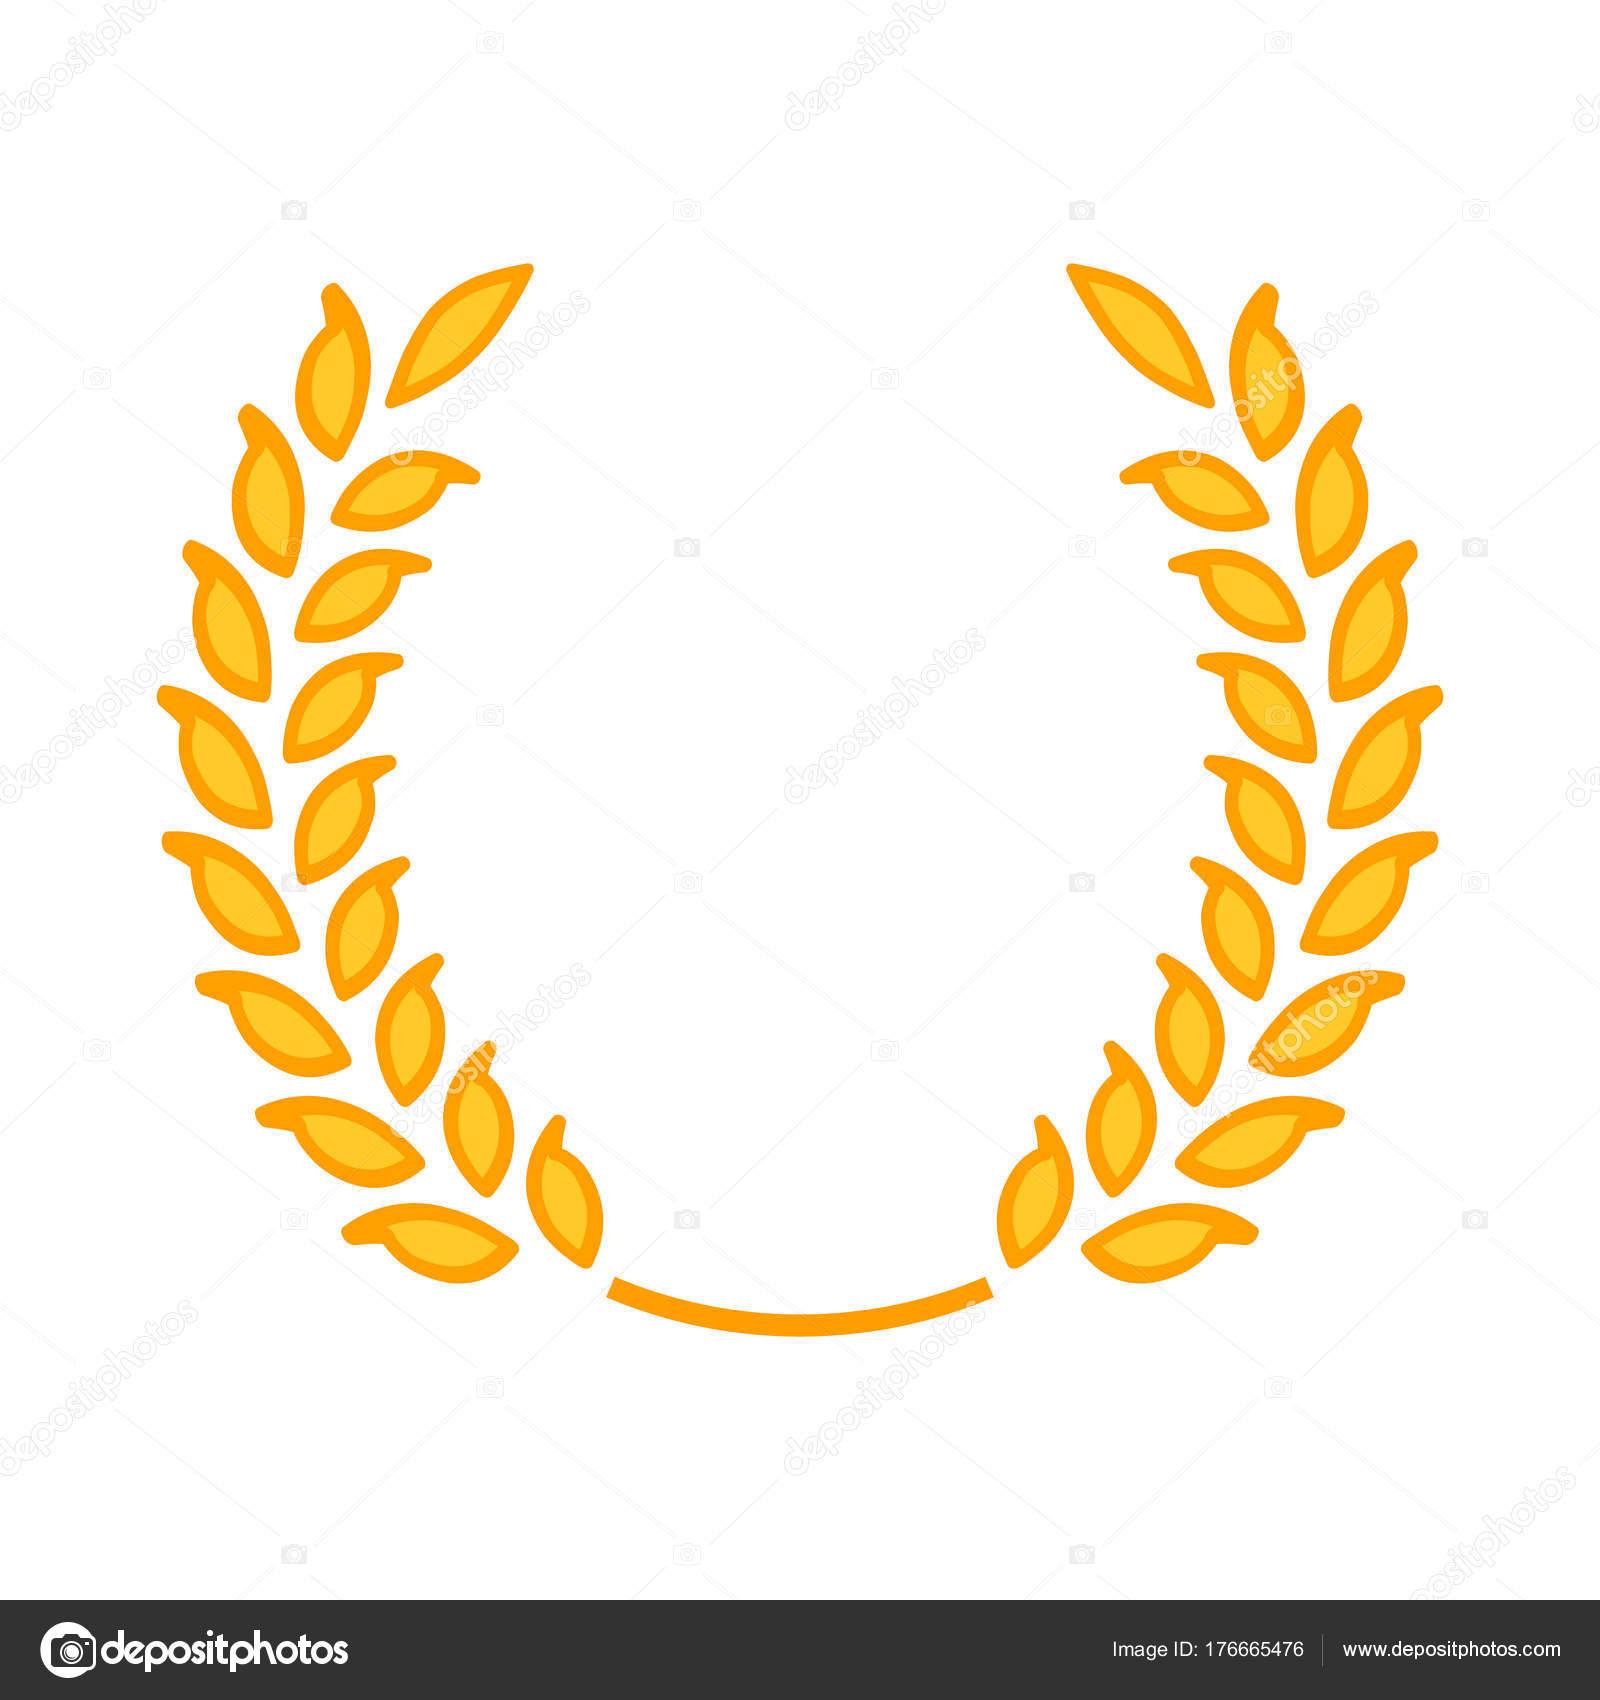 Gold laurel wreath a symbol of the winner wheat ears icon gold laurel wreath a symbol of the winner wheat ears icon stock buycottarizona Image collections